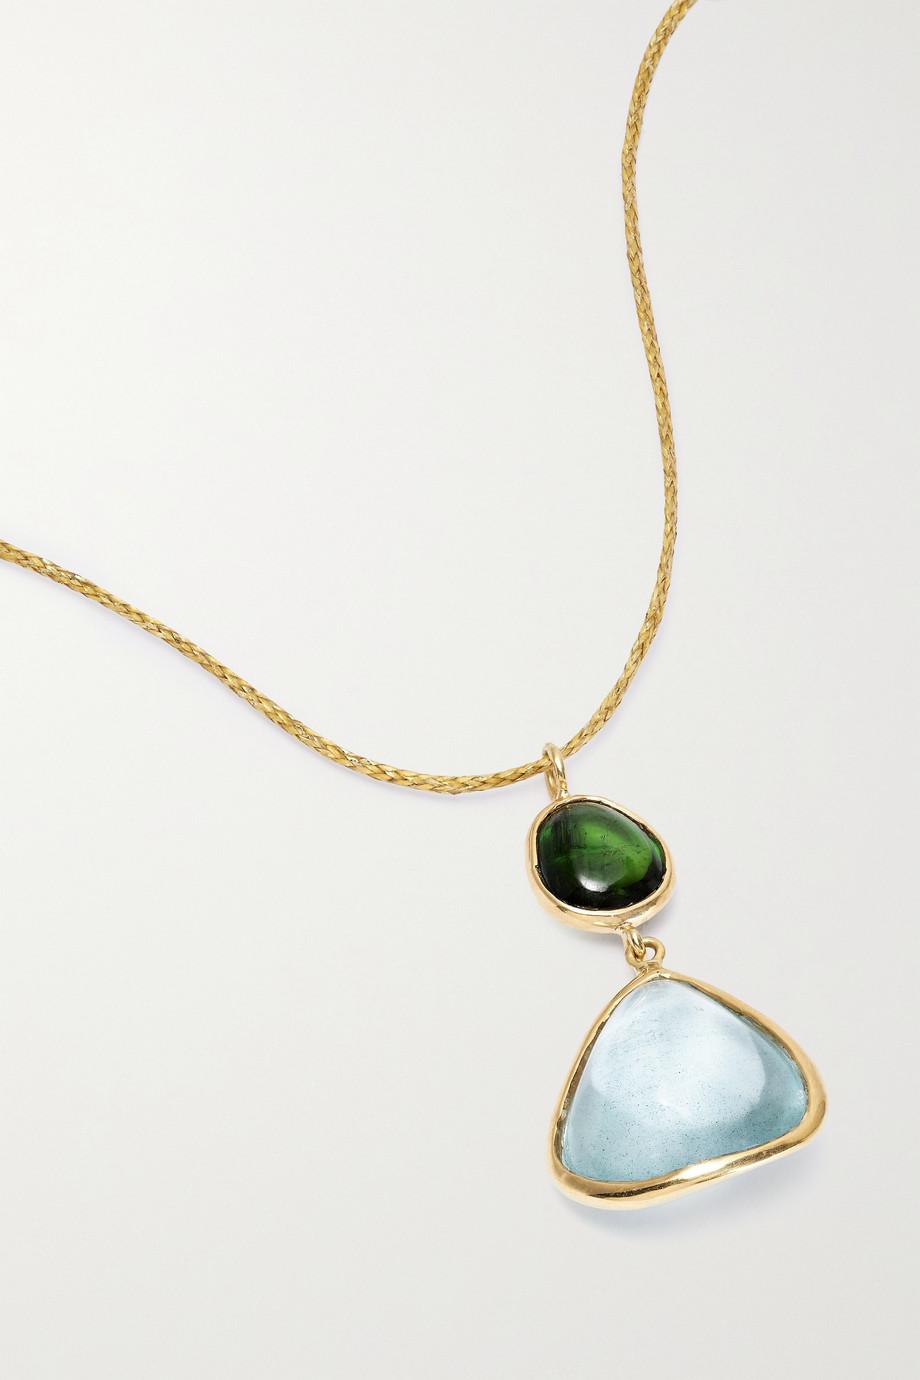 Pippa Small Kette aus 18 Karat Gold mit Turmalin und Aquamarin